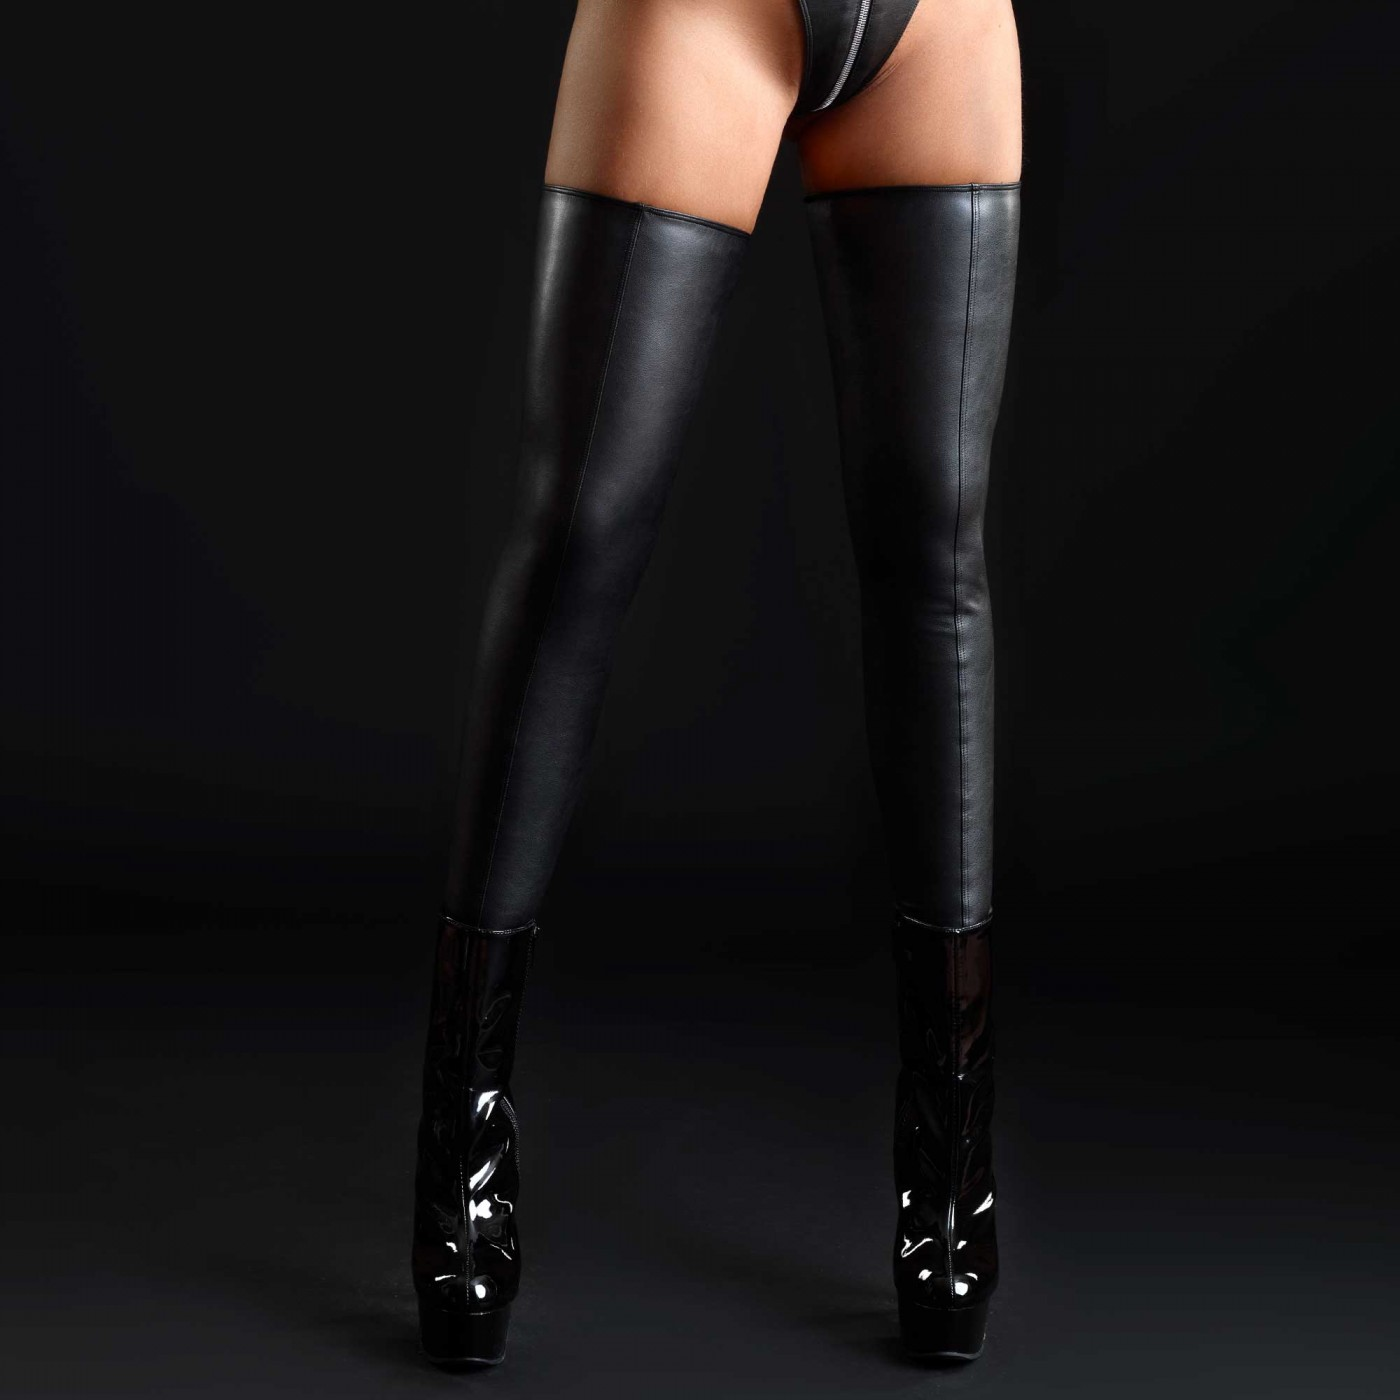 Silicia, faux leather stockings - Patrice Catanzaro